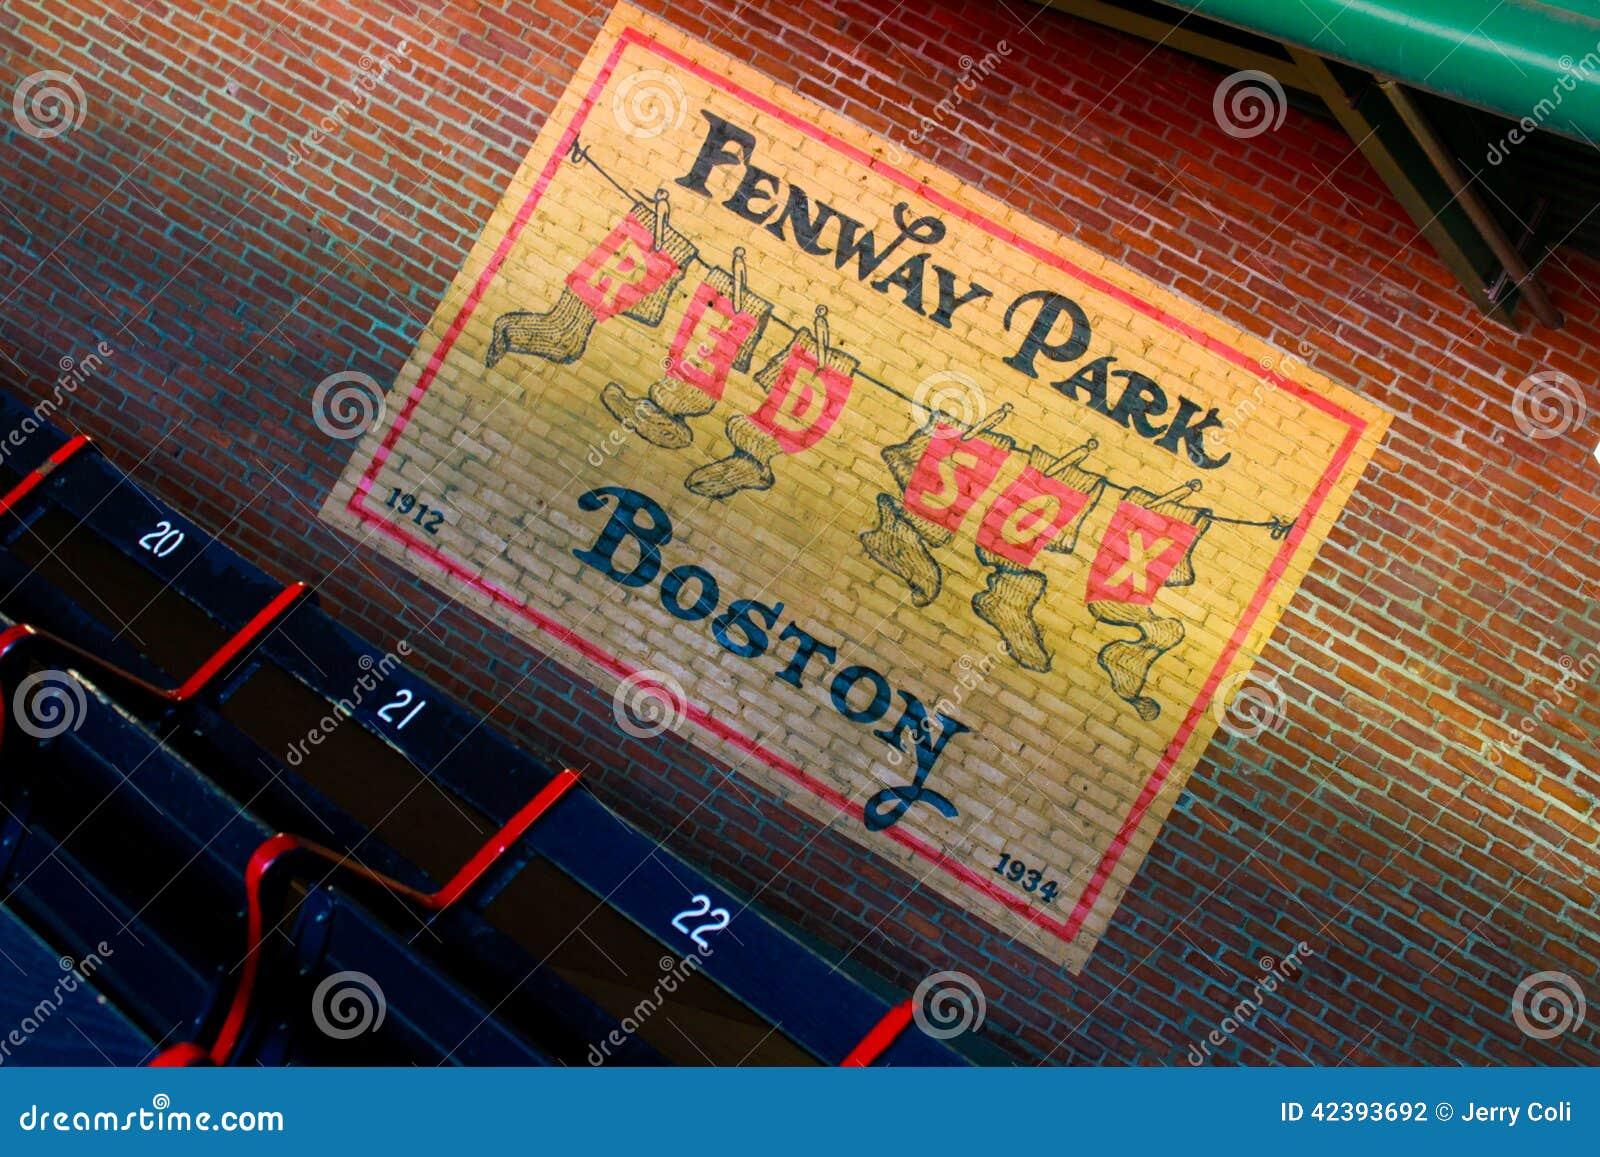 Marvelous Beautiful Fenway Park Wall Mural Idea · Exceptional Fenway Park Wall Mural  Awesome Ideas Part 5